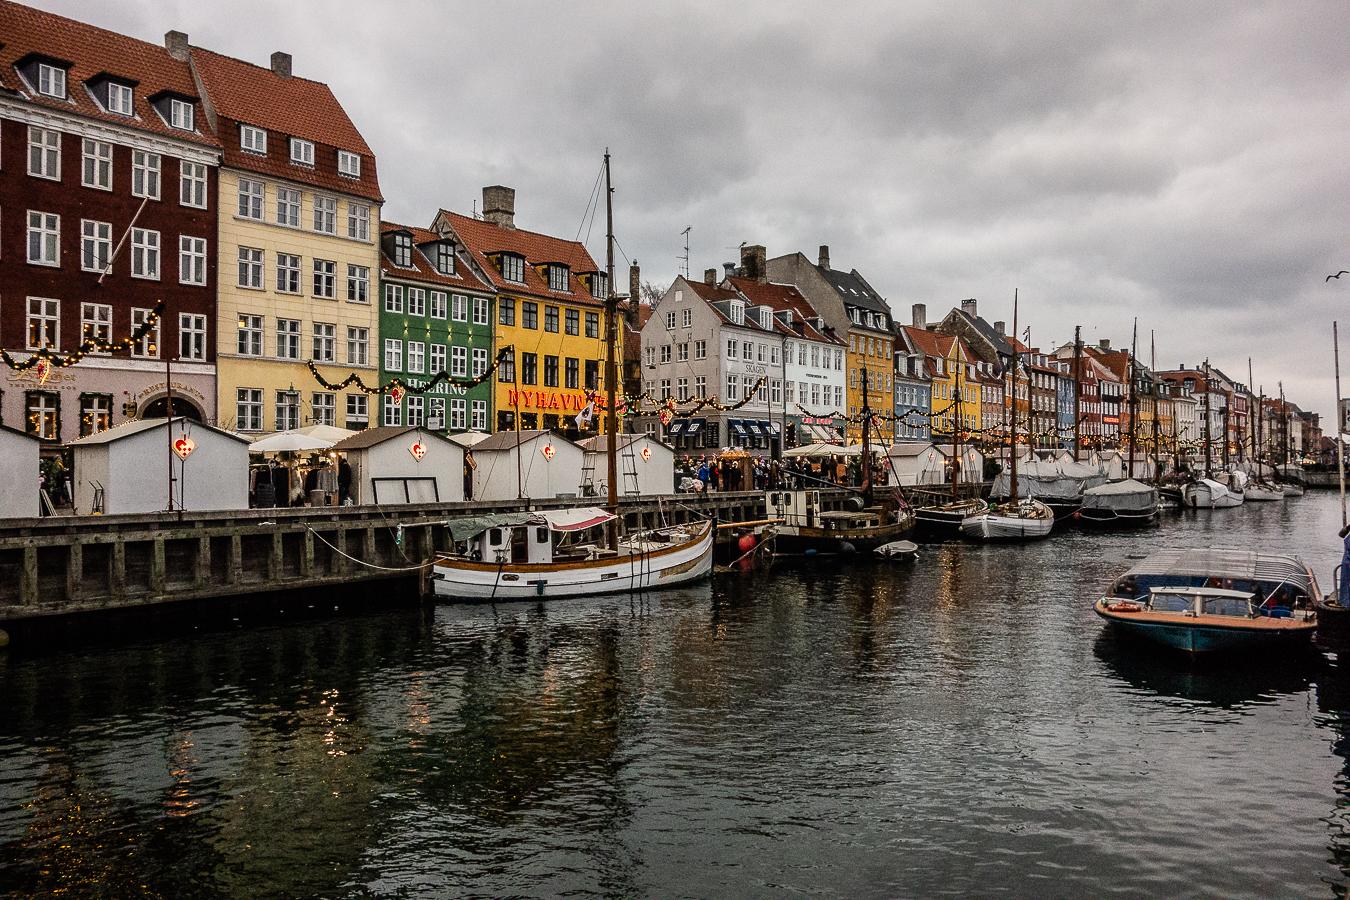 Copanaghem, Nyhavn